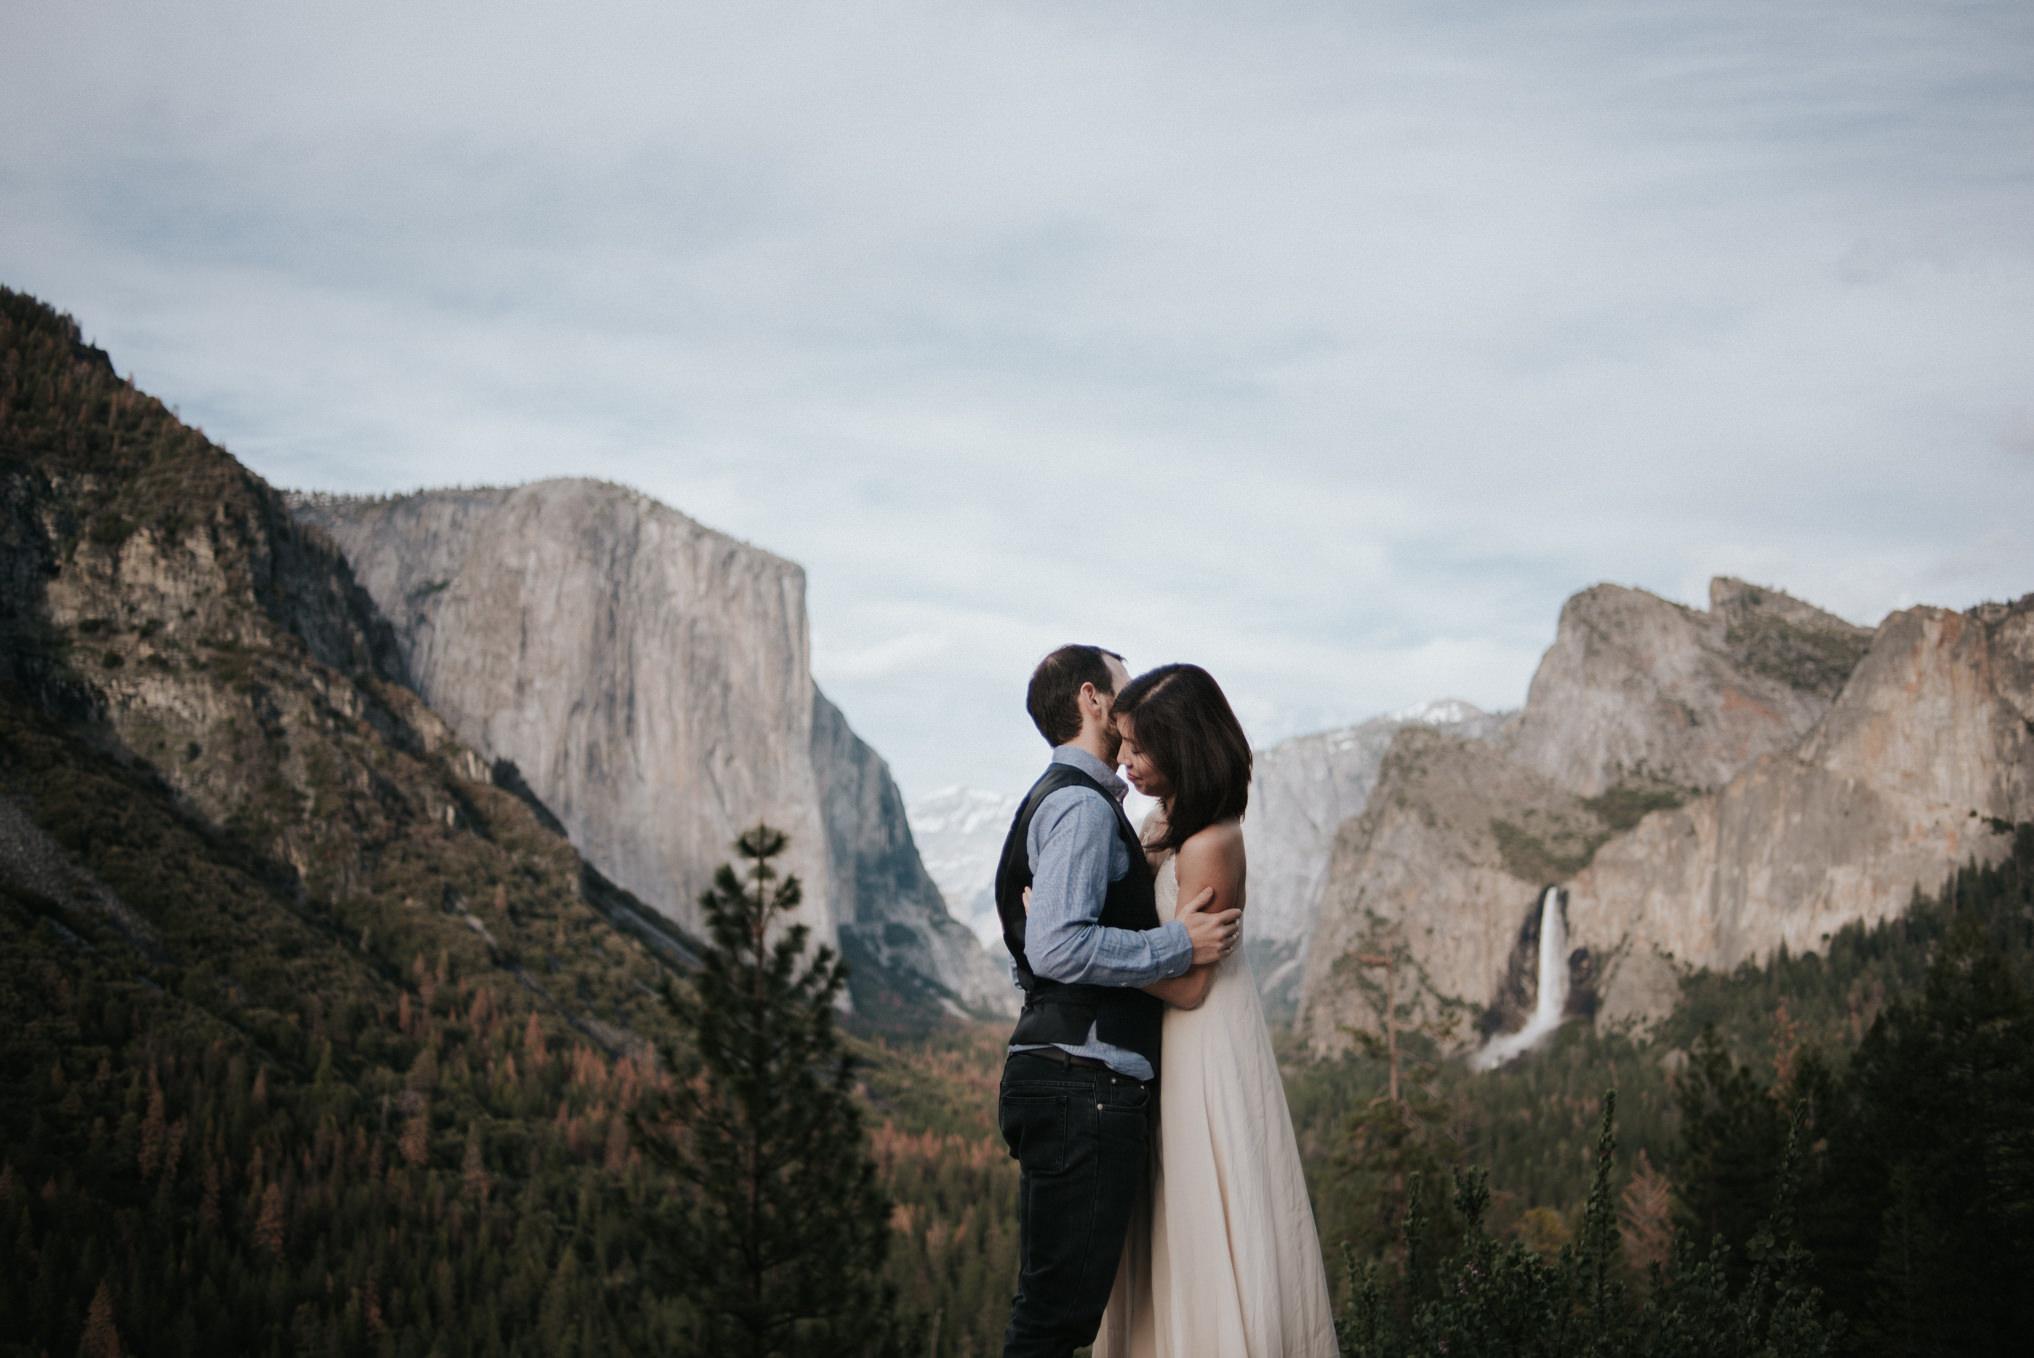 Corina Amp James Yosemite Wedding Portraits Daring Wanderer